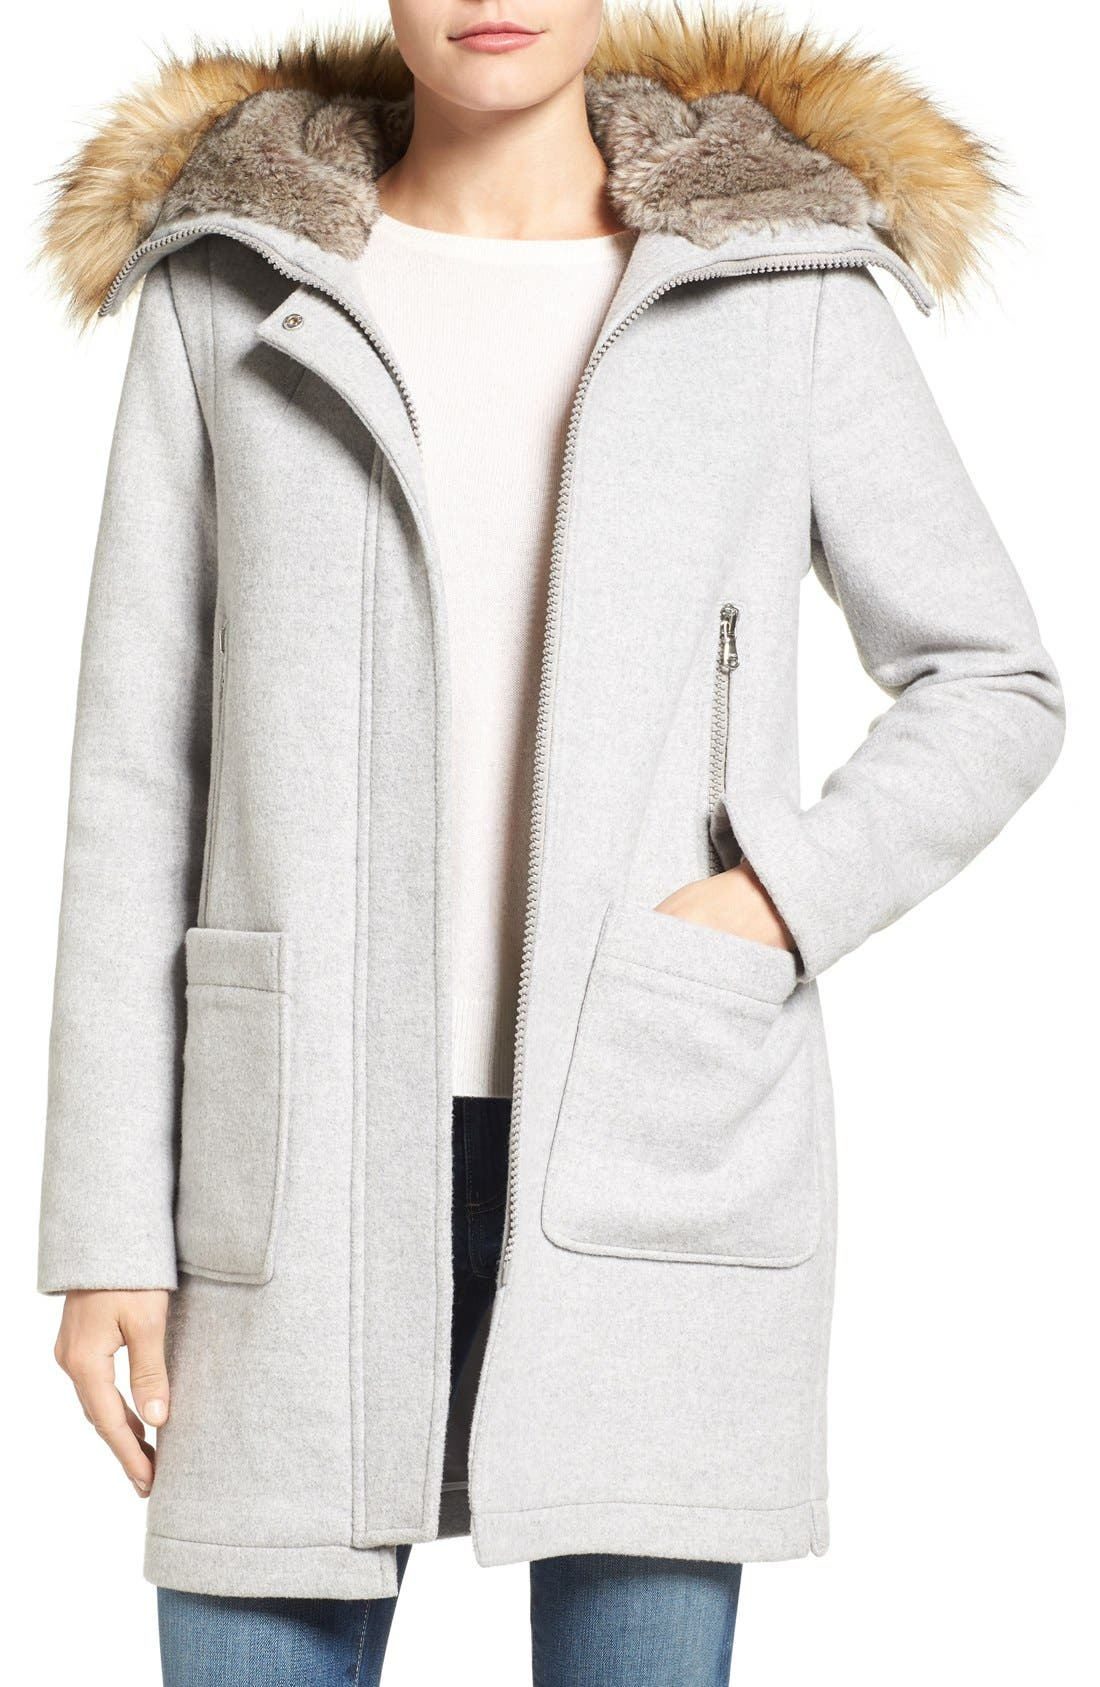 Wool Blend Duffle Coat with Faux Fur Trim Hood,                         Main,                         color, Light Grey